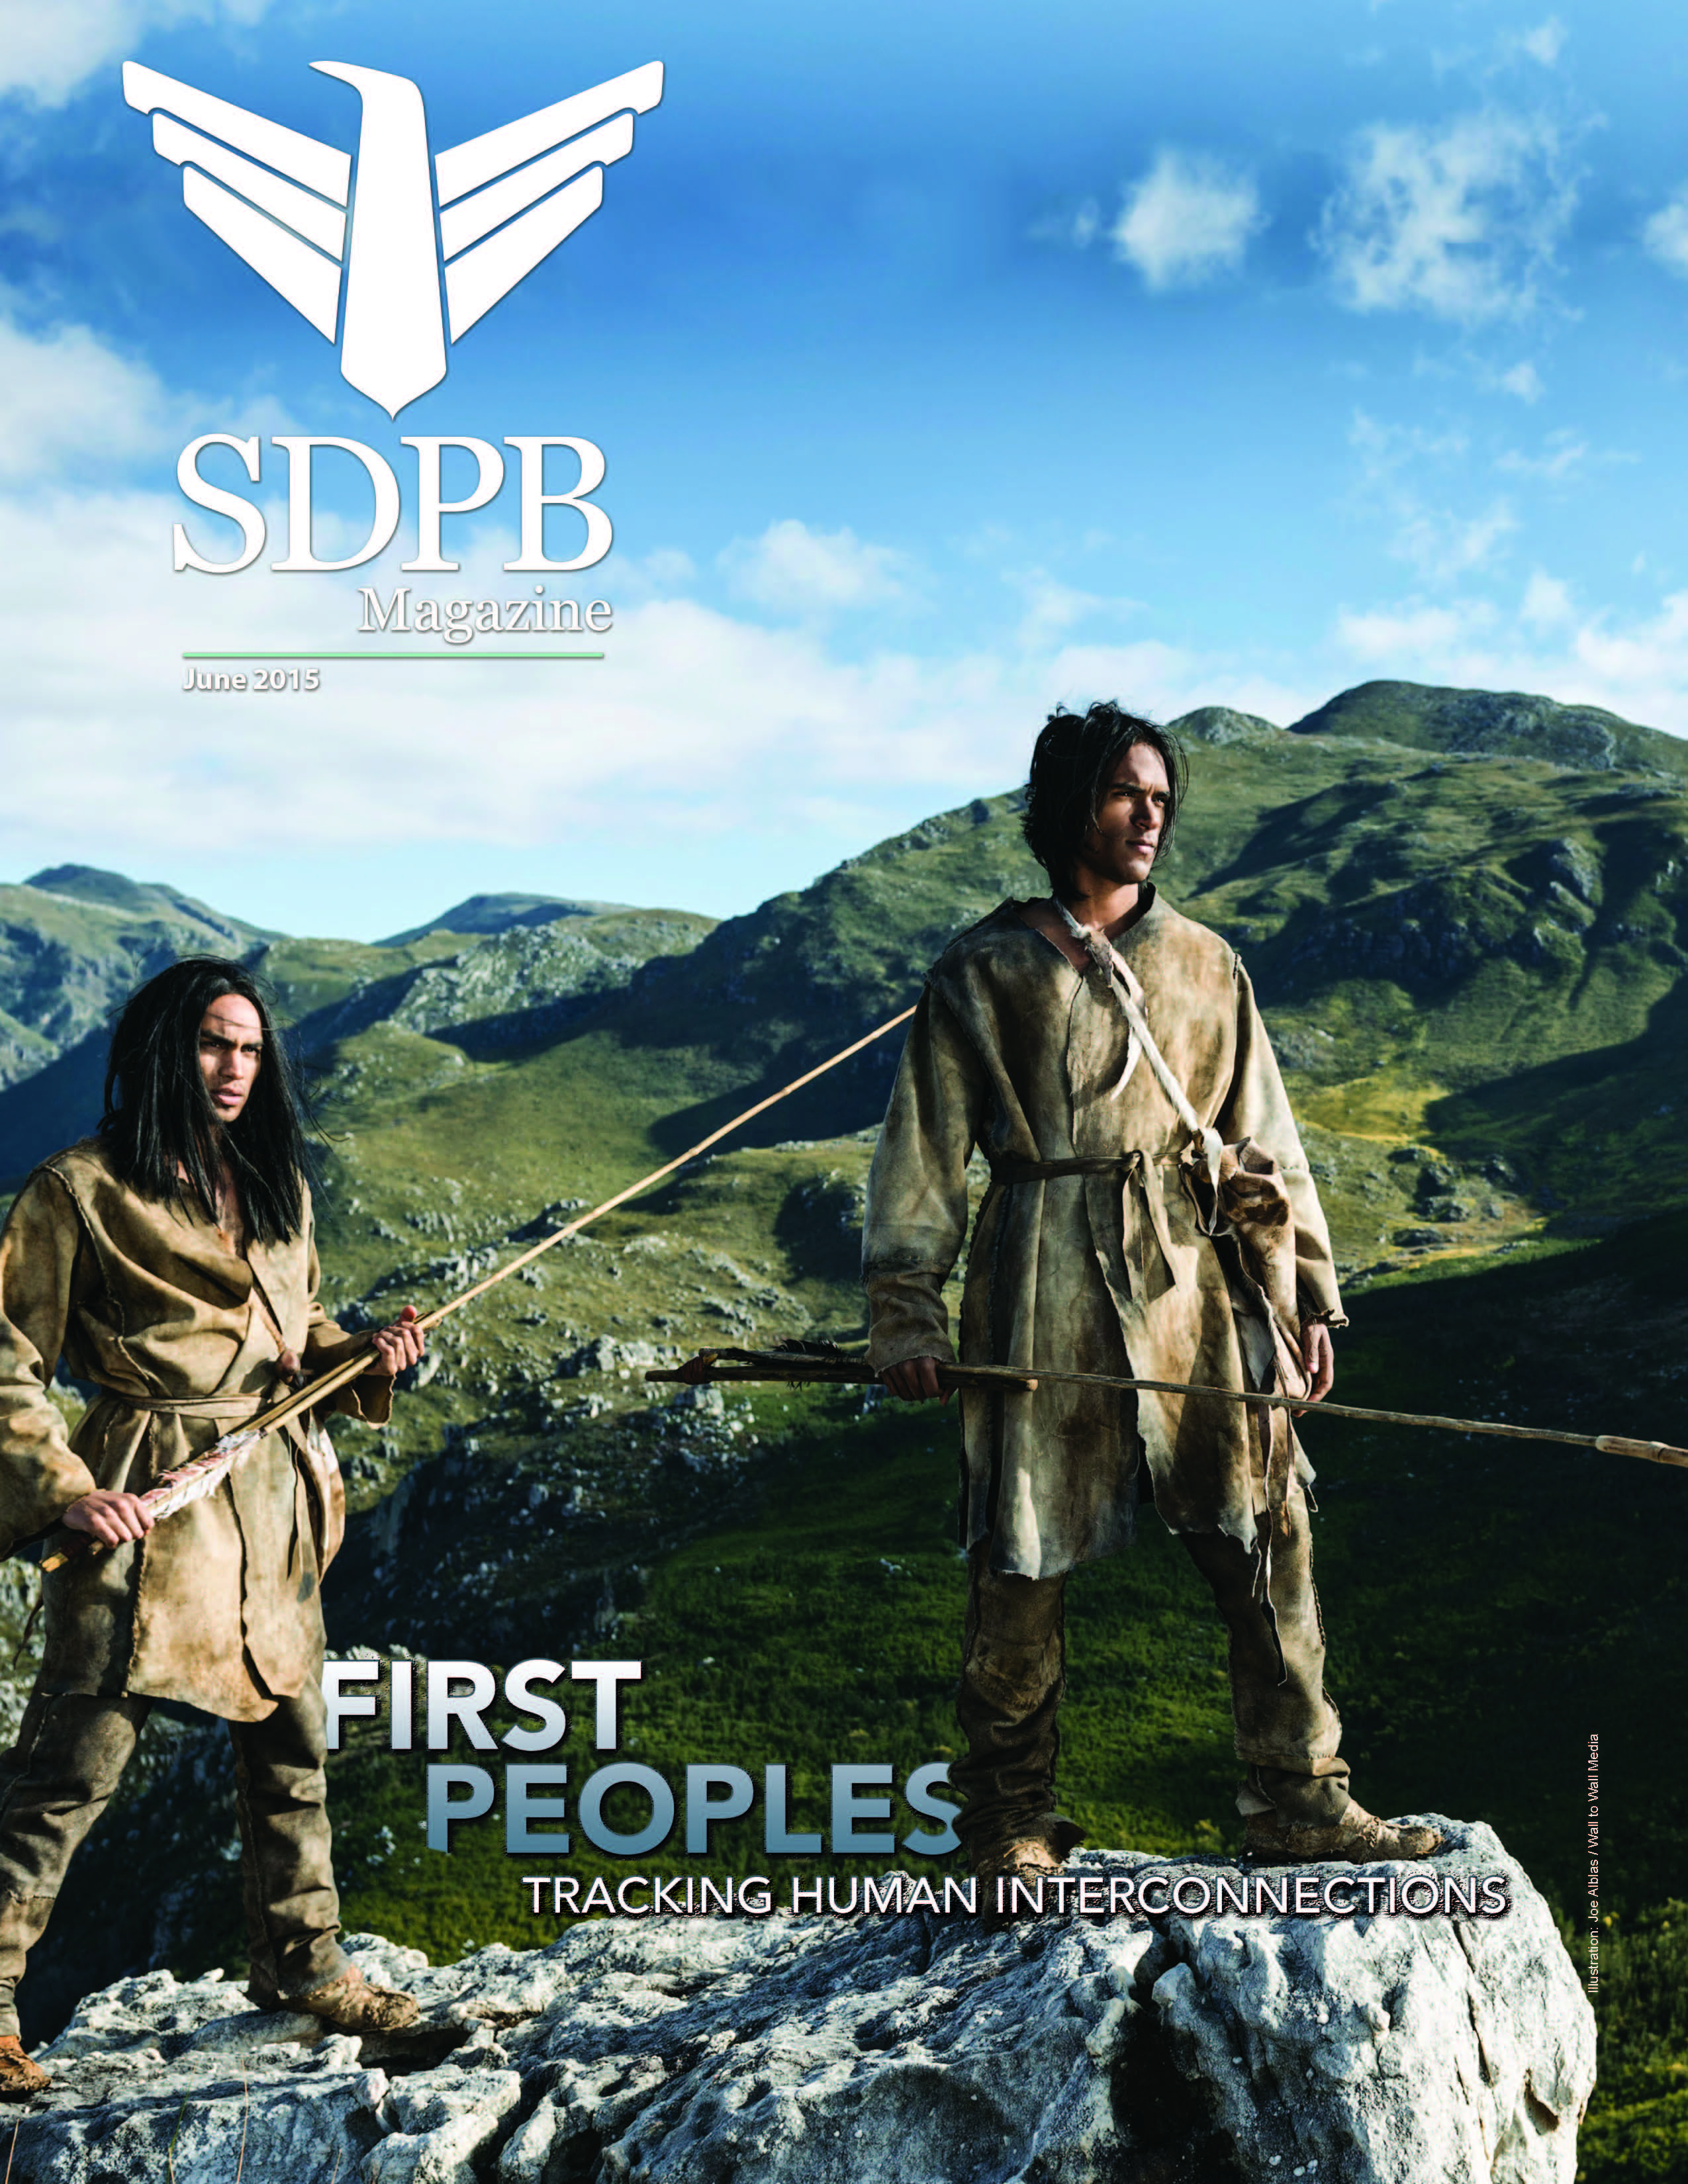 sdpb magazine cover image